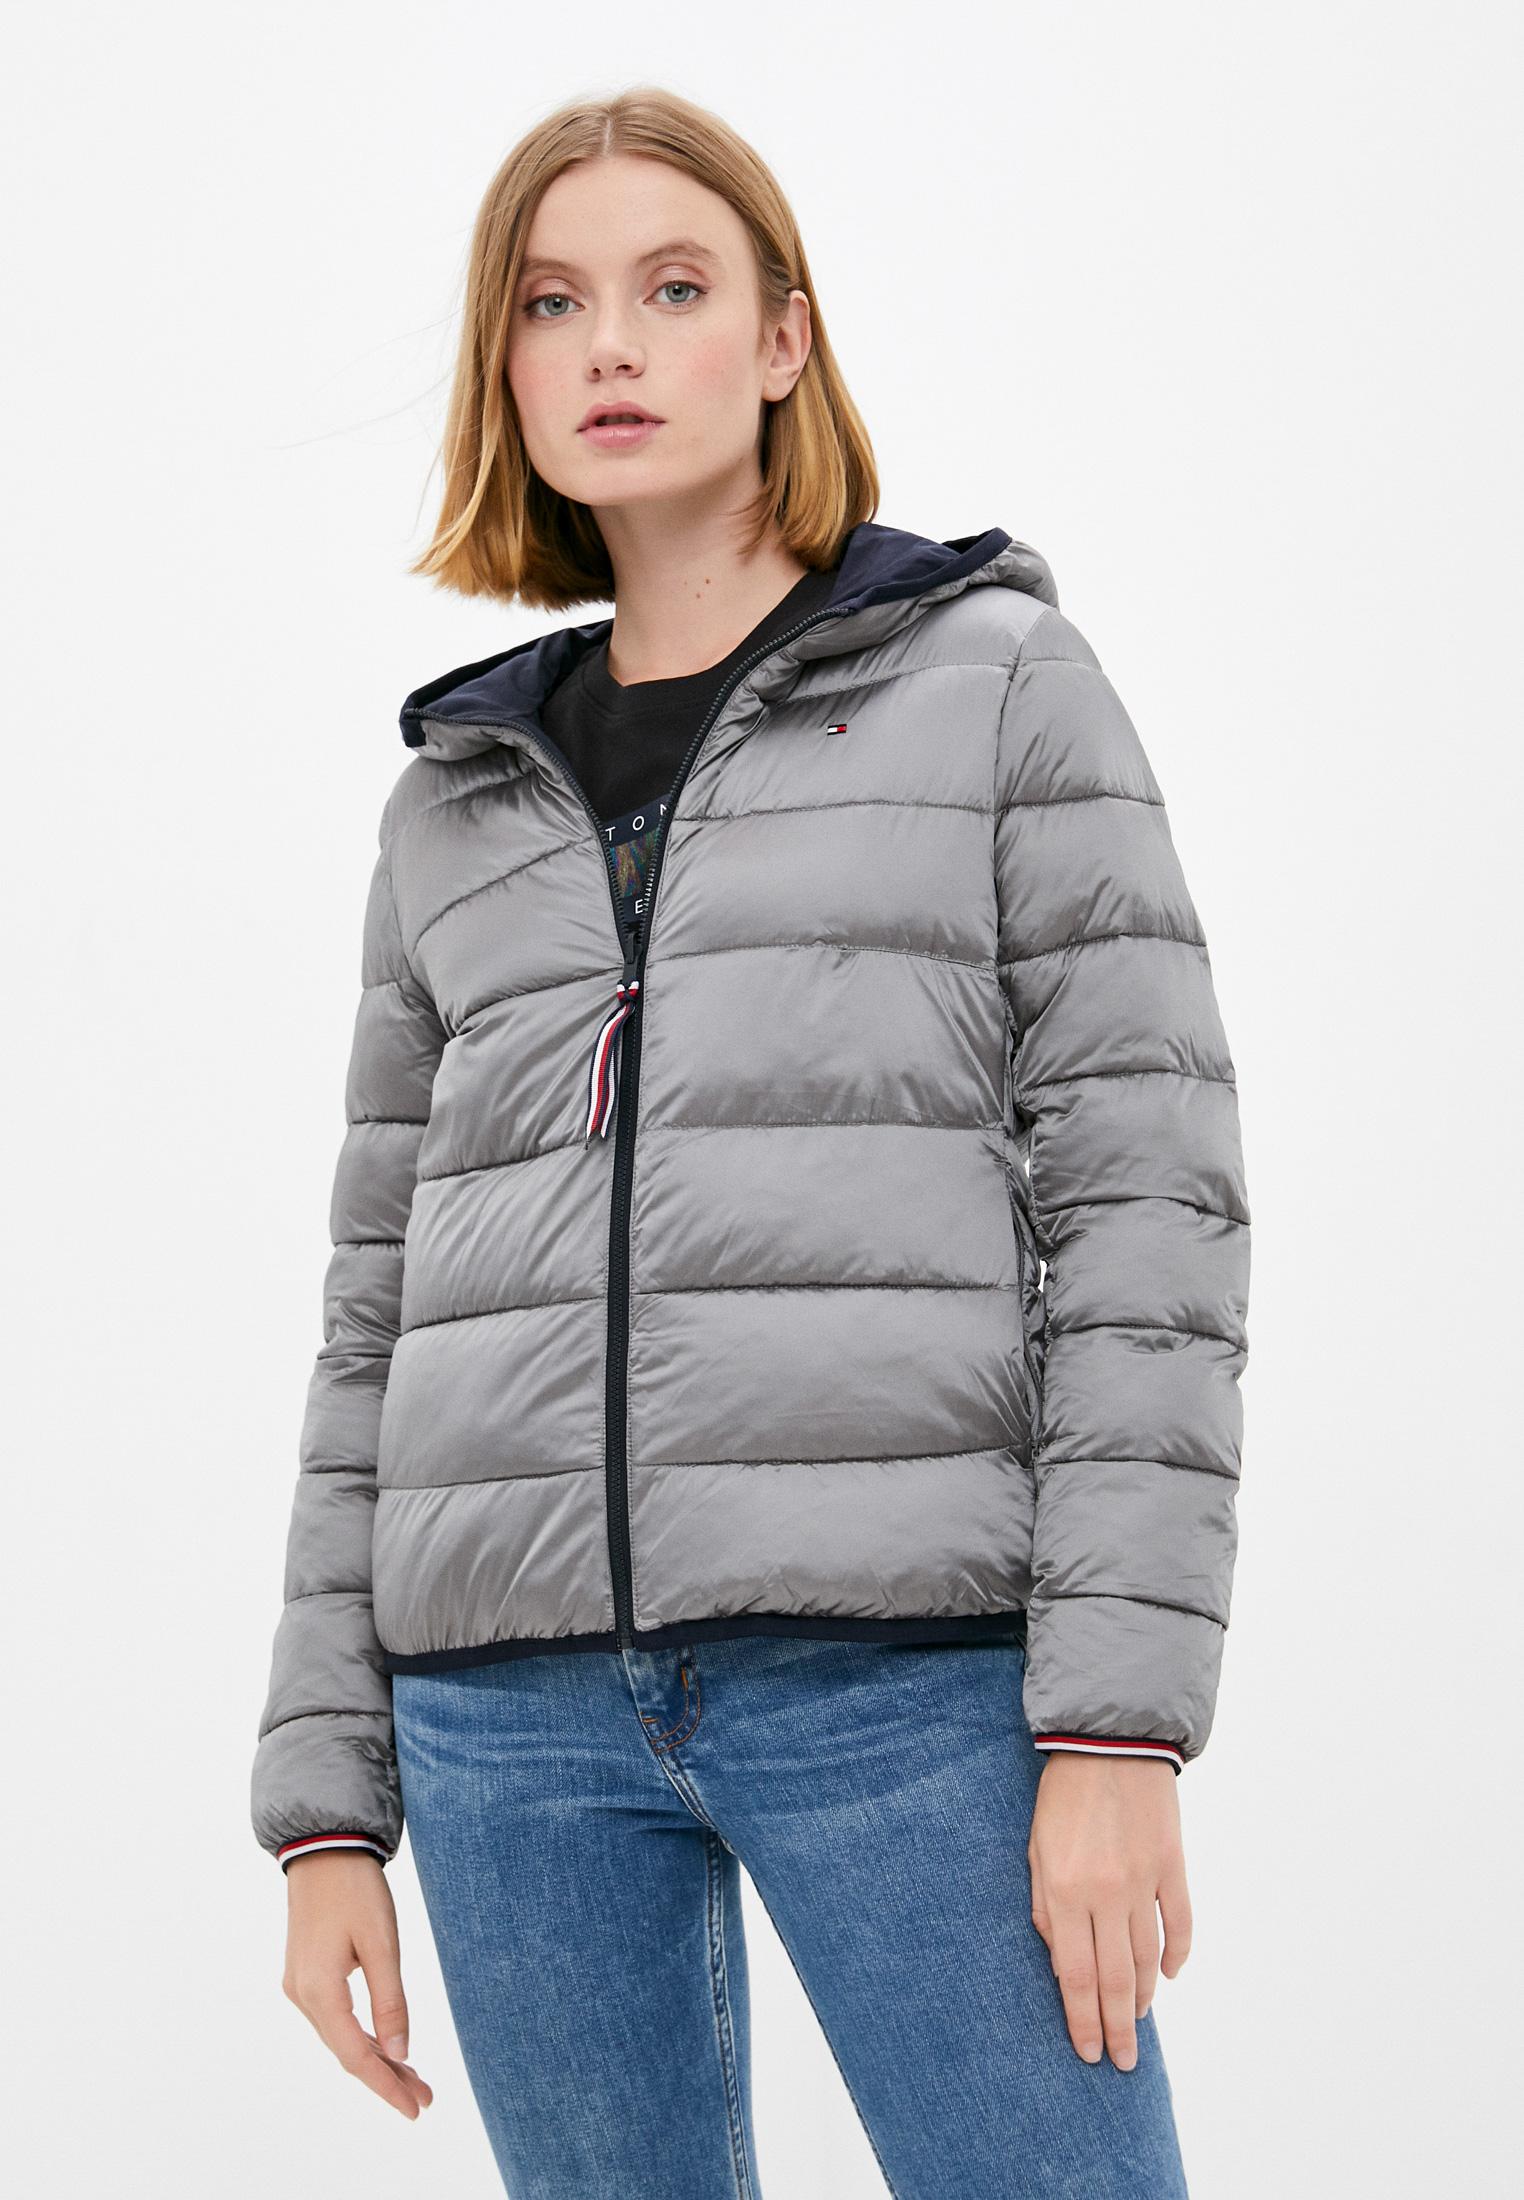 Утепленная куртка Tommy Hilfiger (Томми Хилфигер) WW0WW32036